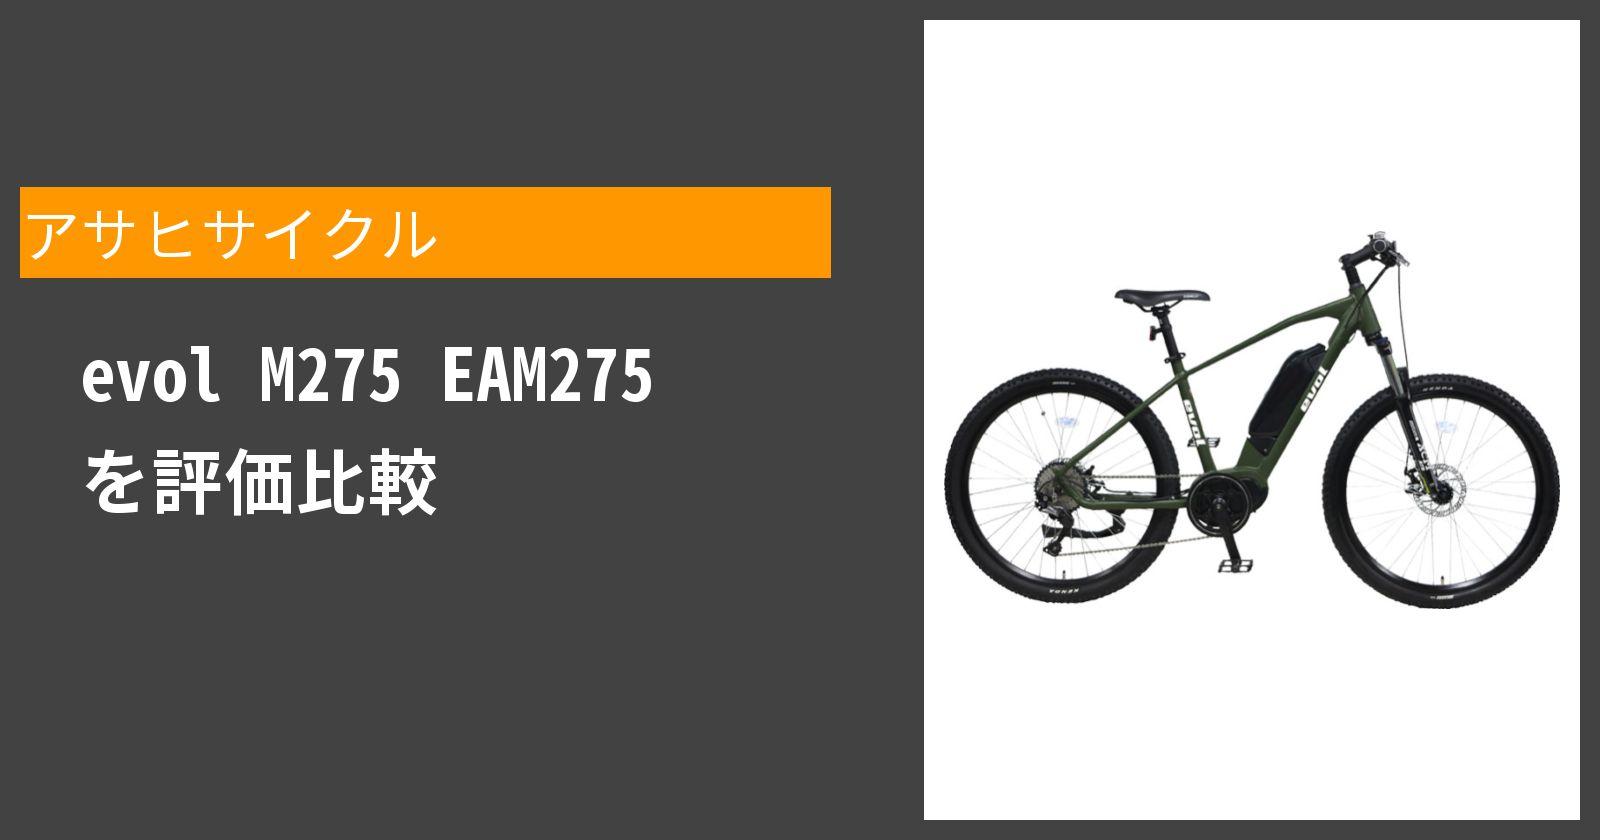 evol M275 EAM275を徹底評価